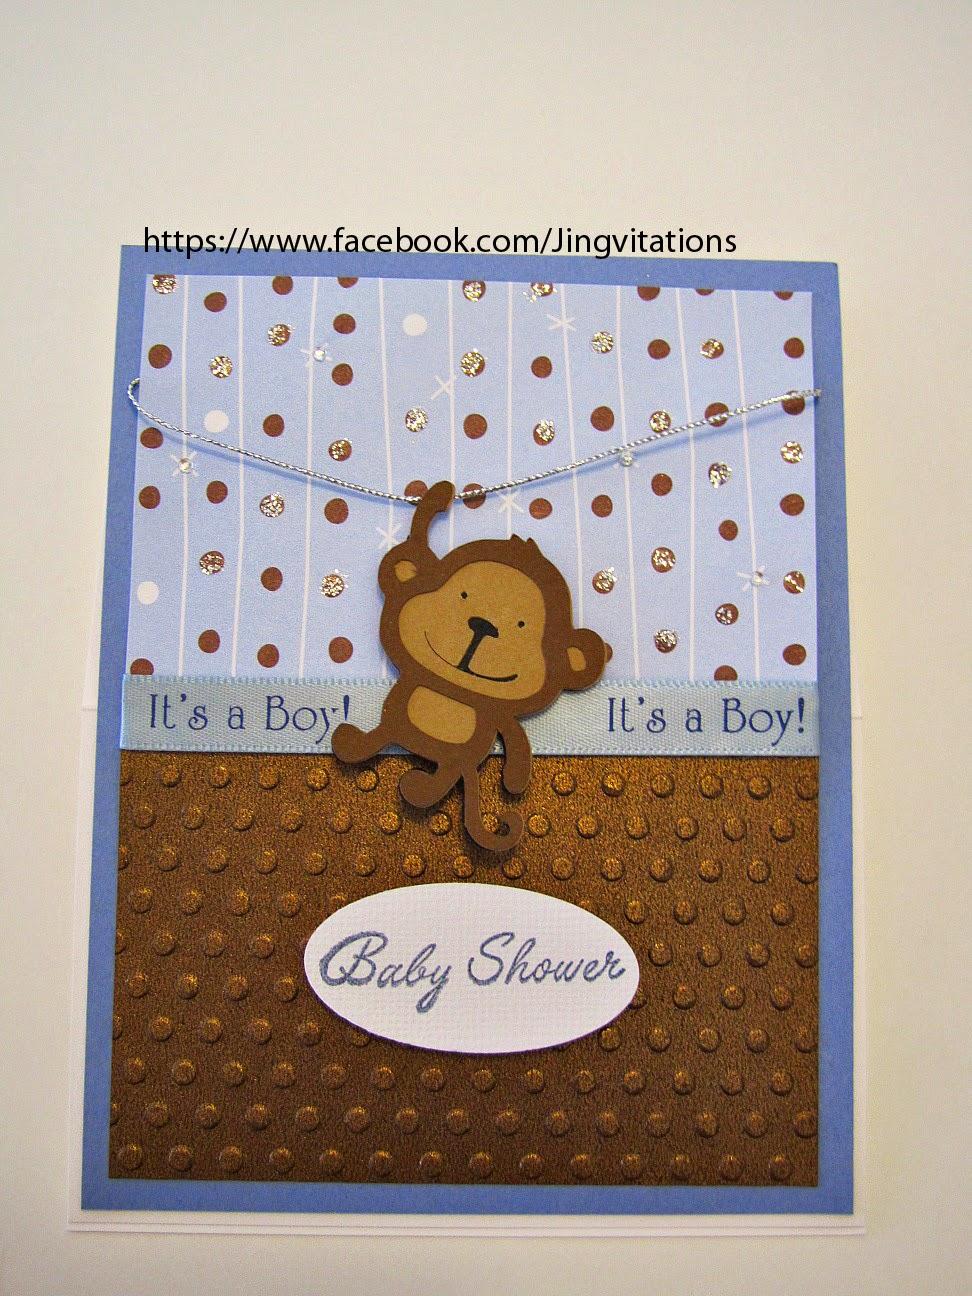 Jingvitations monkey theme for baby shower invitations - Baby shower monkey pictures ...